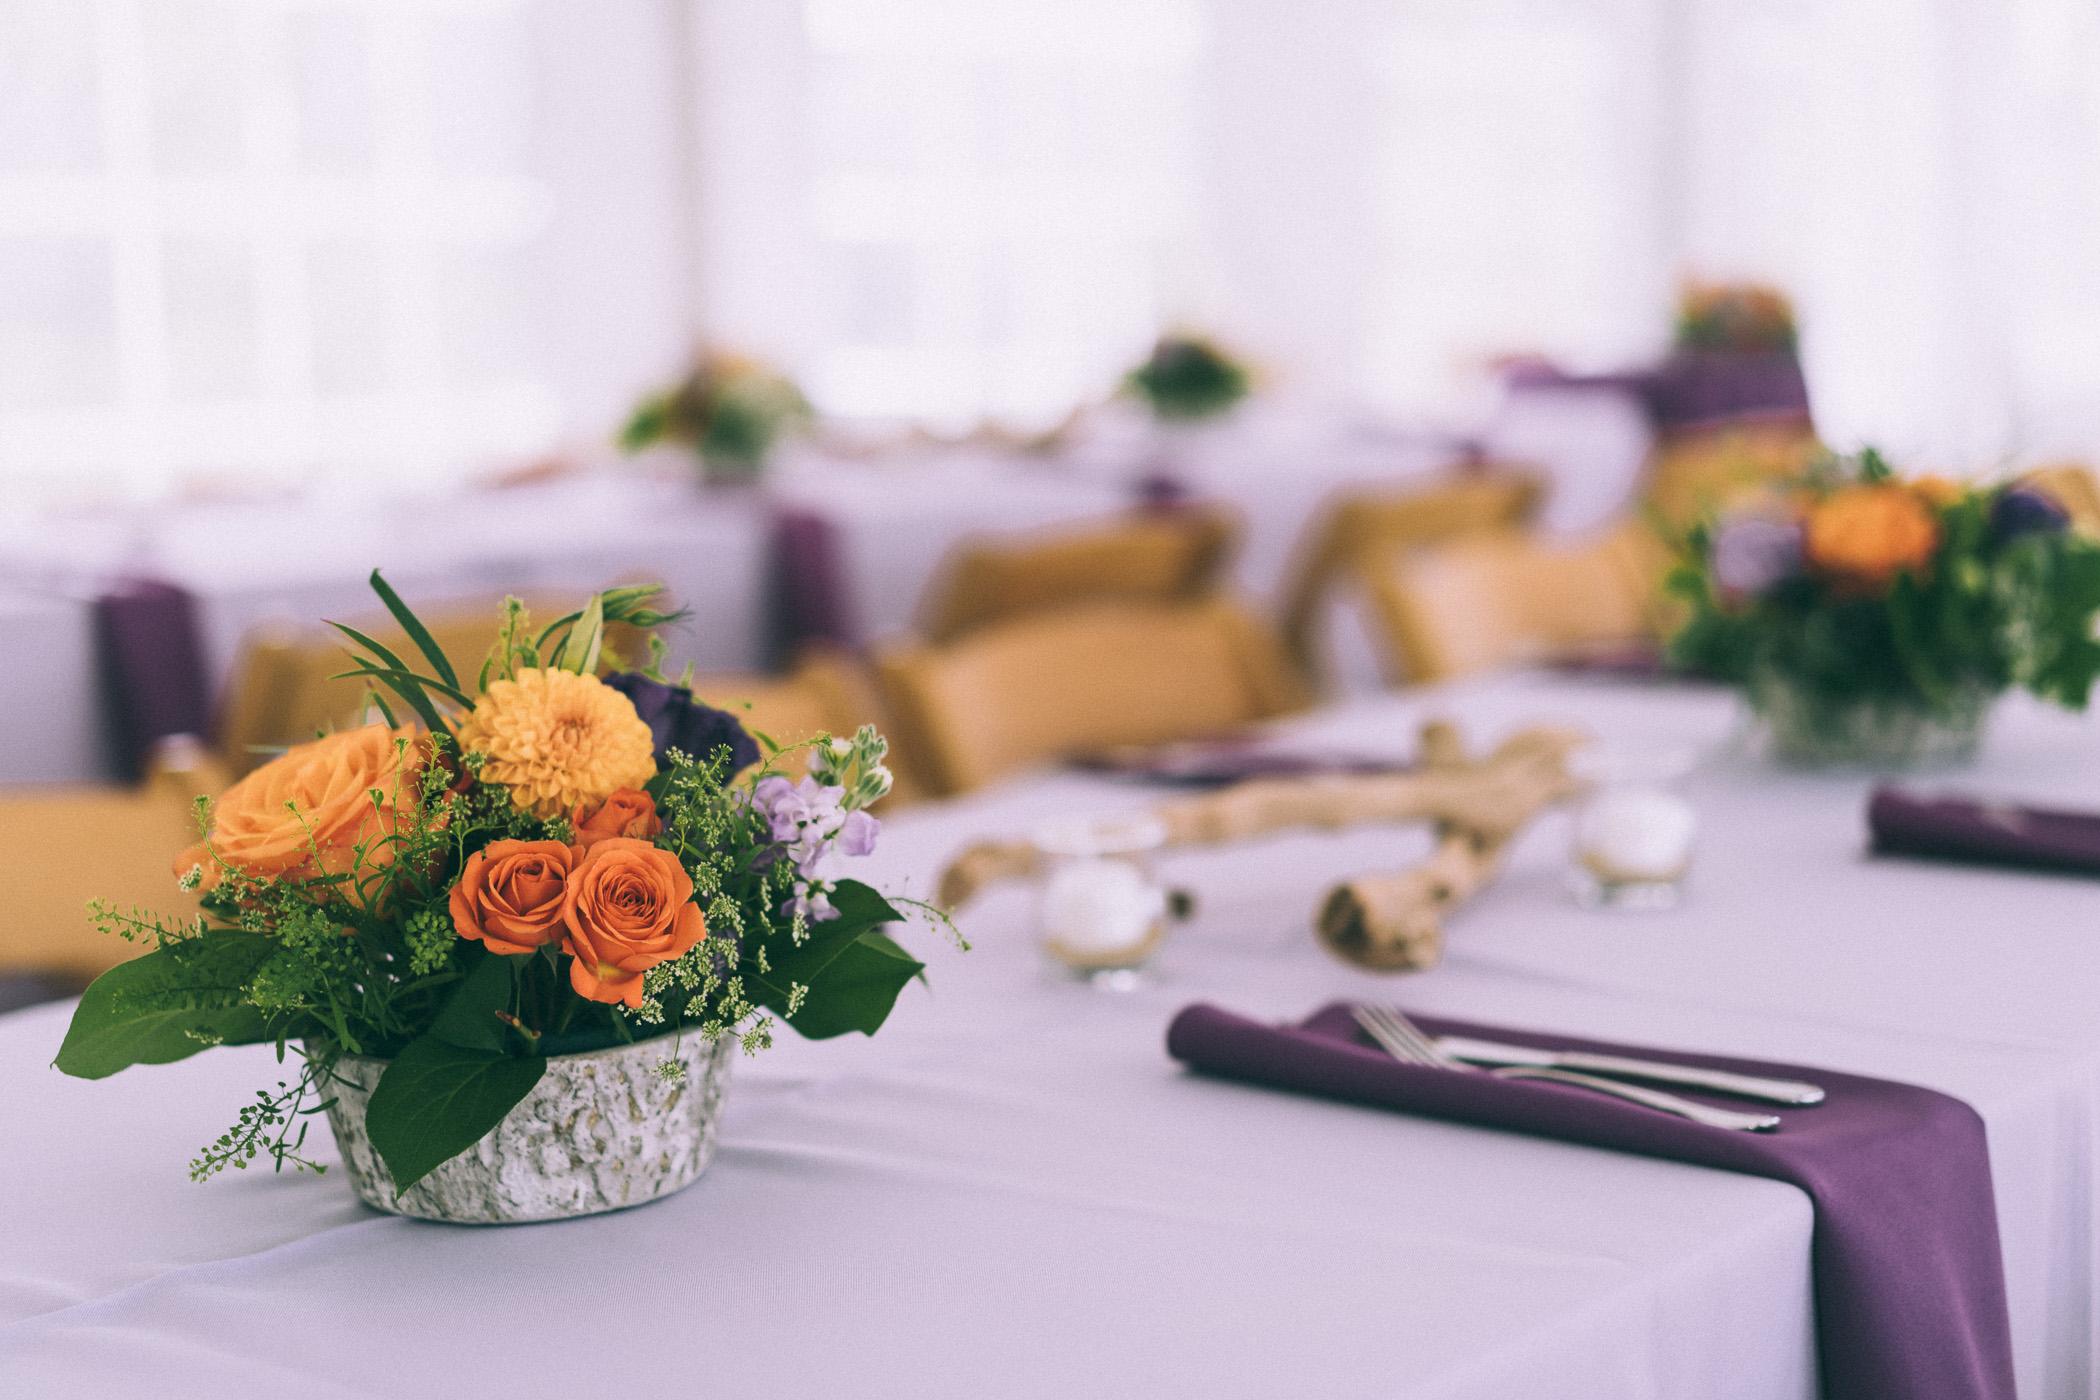 18-Faux Wedding-brandon shane warren-1.jpg